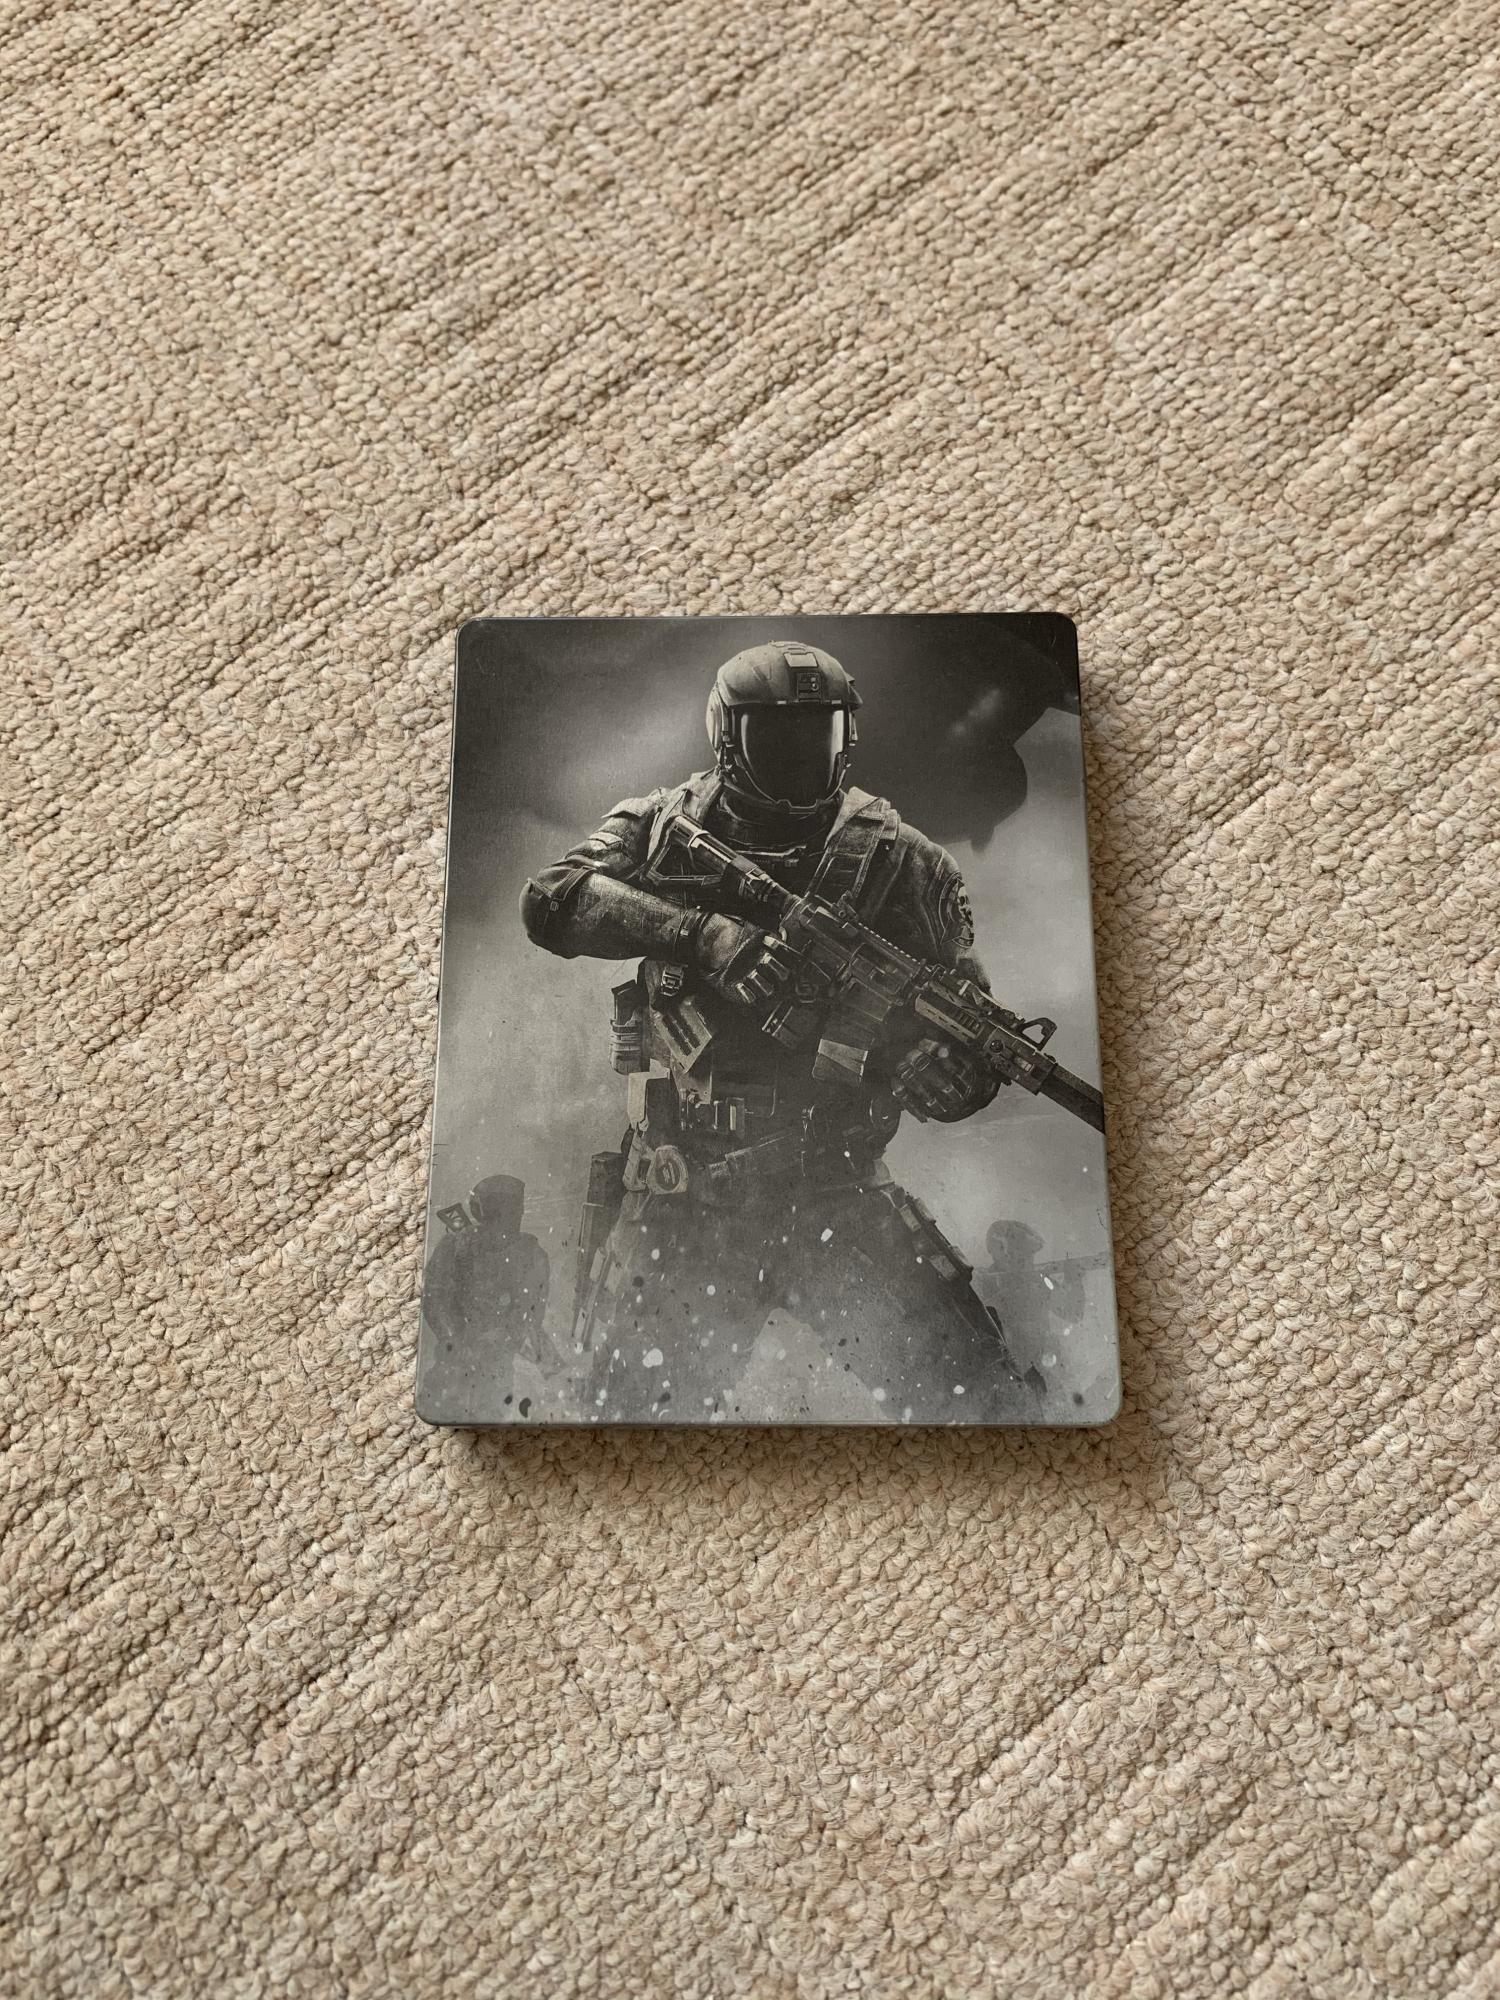 Call Of Duty Infinite Warfare PS4 в Москве 89168173500 купить 1